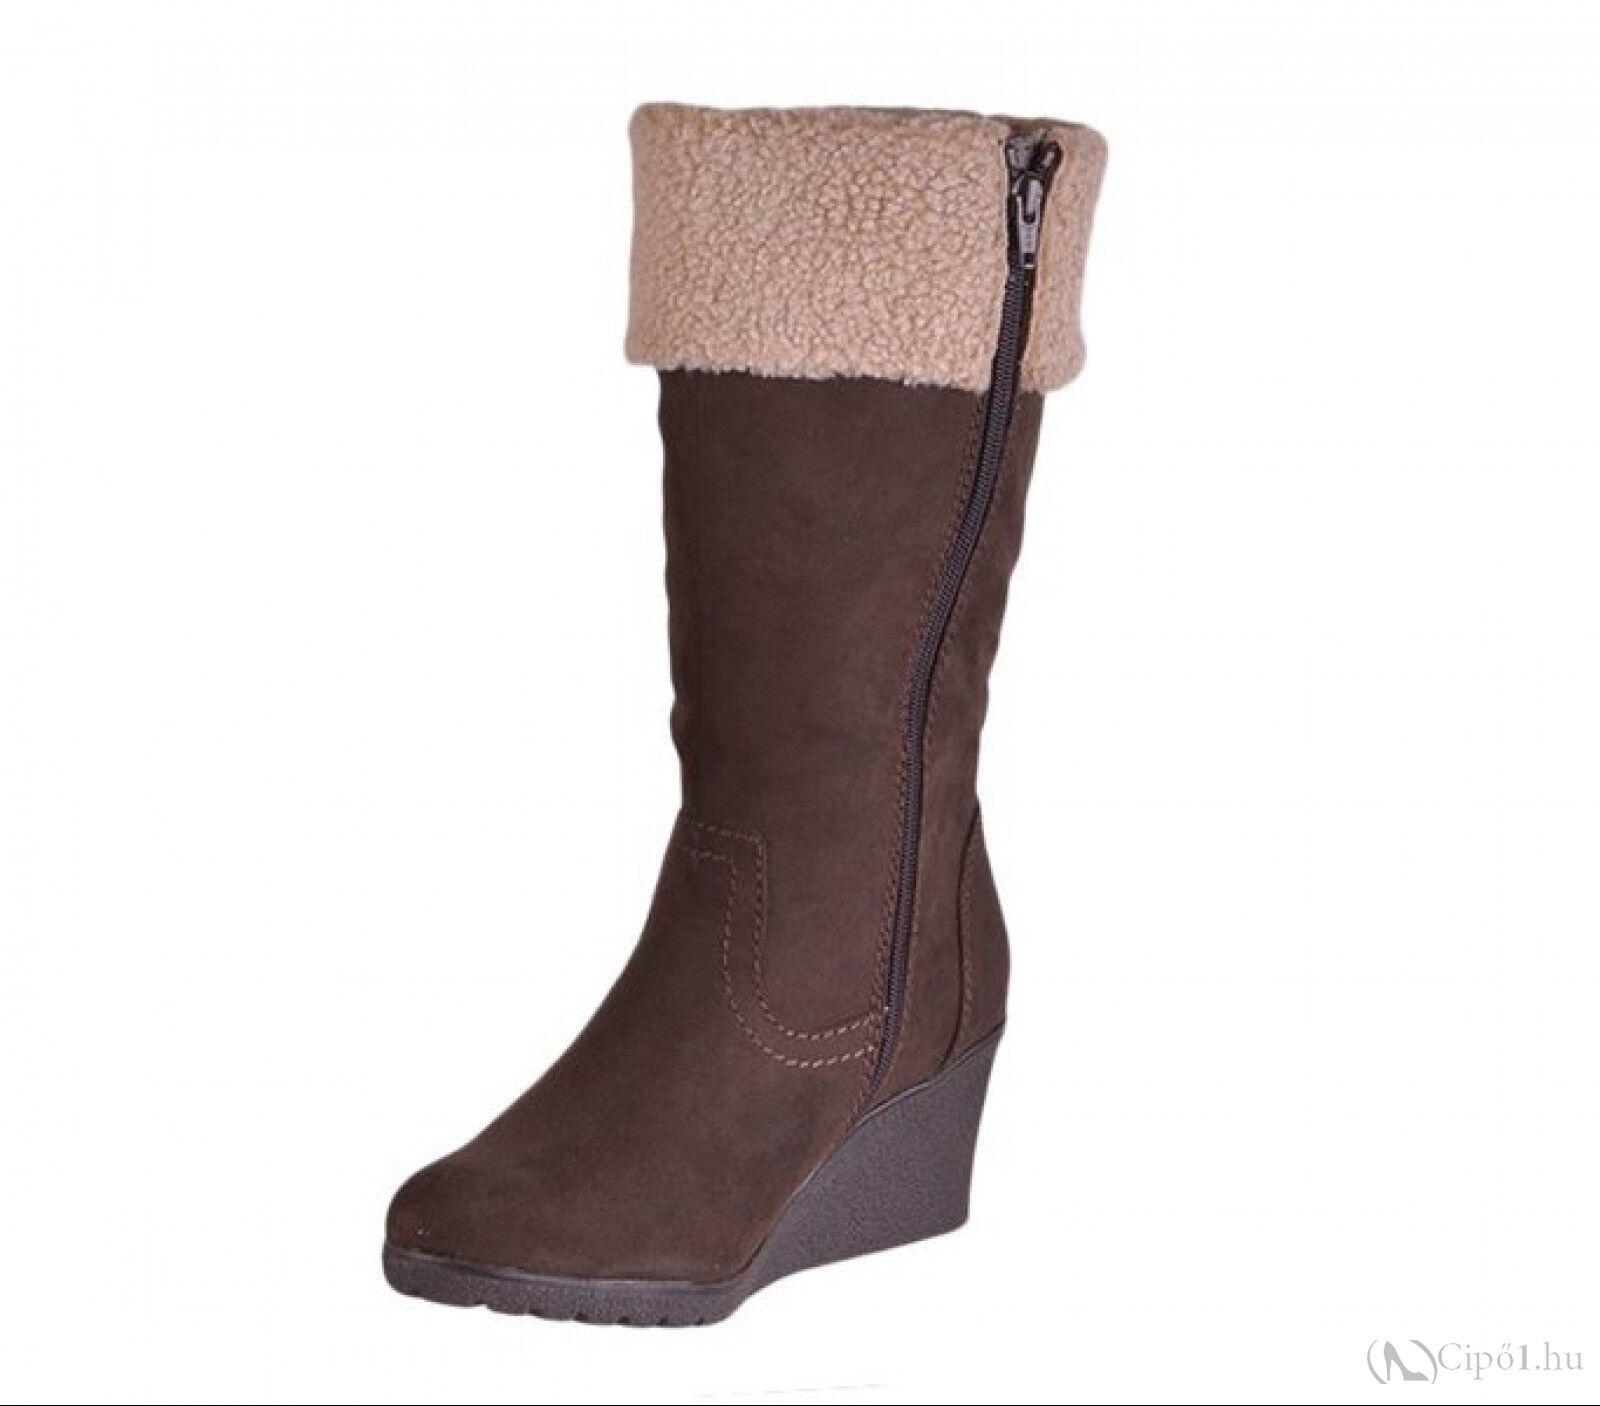 Softline Brown Ladies Womens Wedge Heel Mid Calf Warm Boots Size 5 6 7 7.5 8